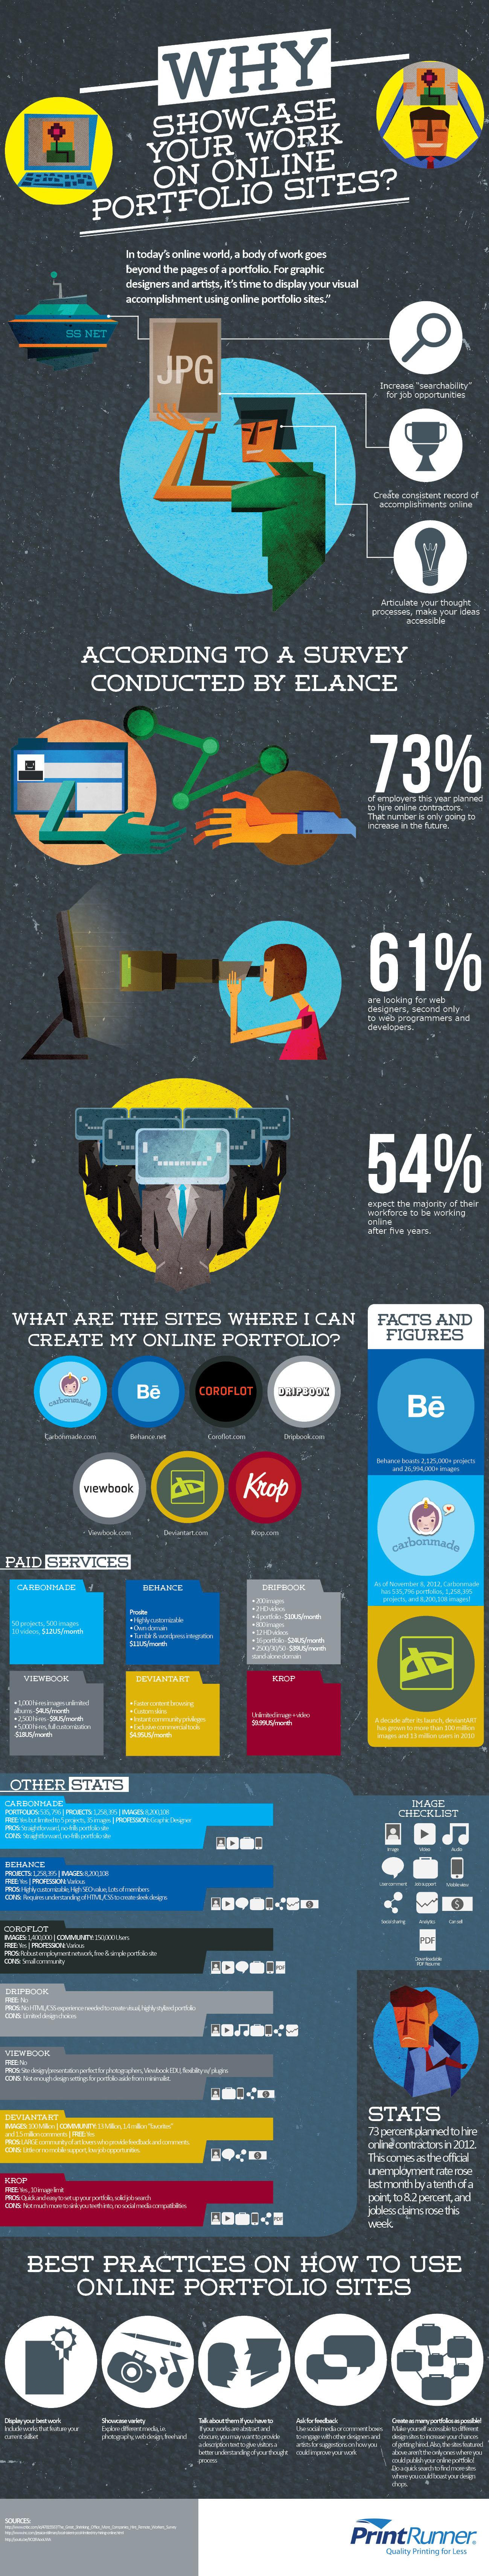 Why Showcase Your Works on Online Portfolio Sites?